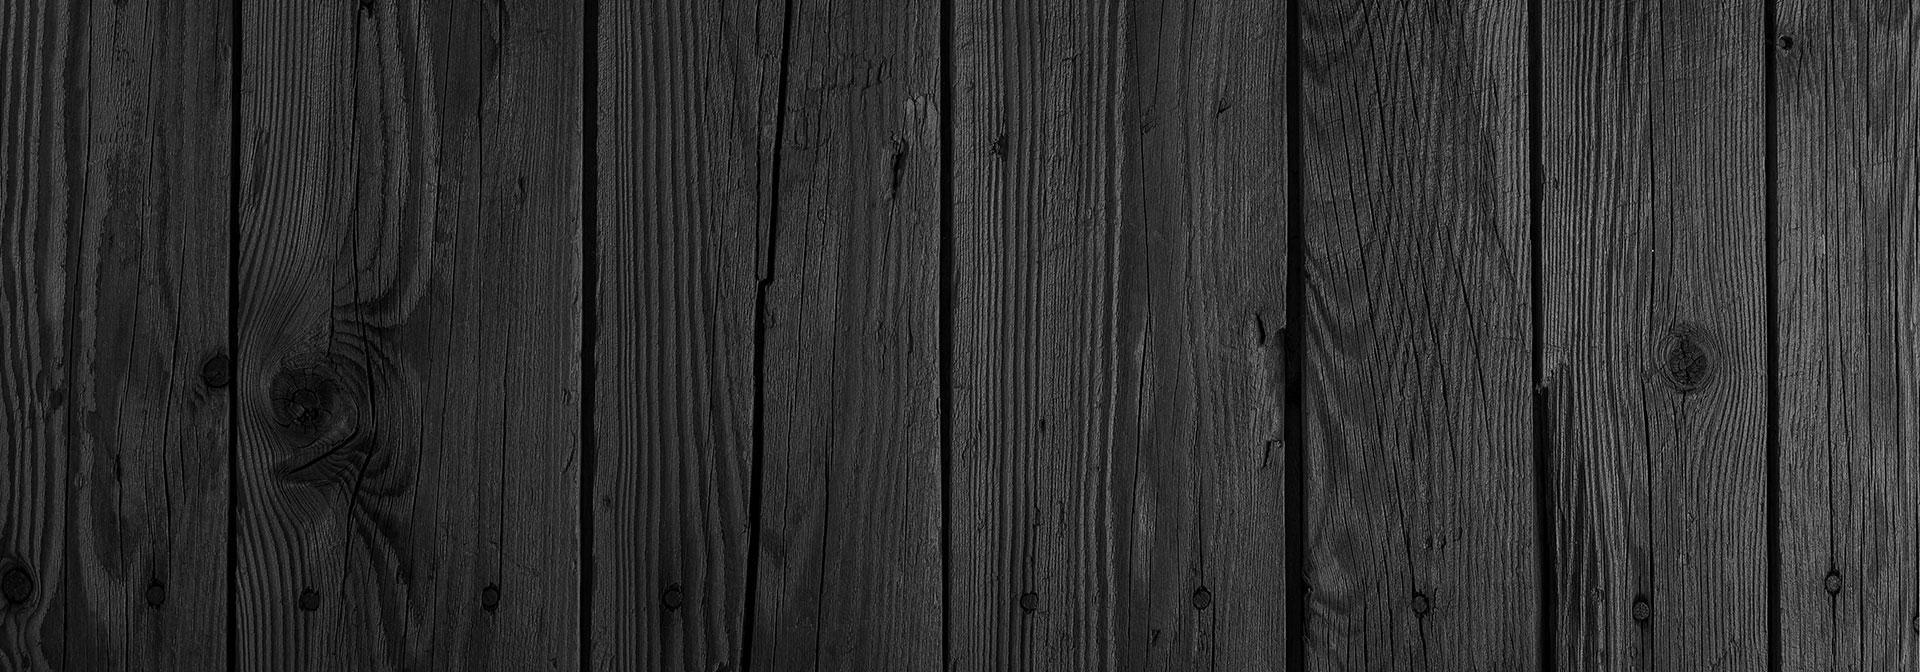 shou-sugi-ban-fassadenholz